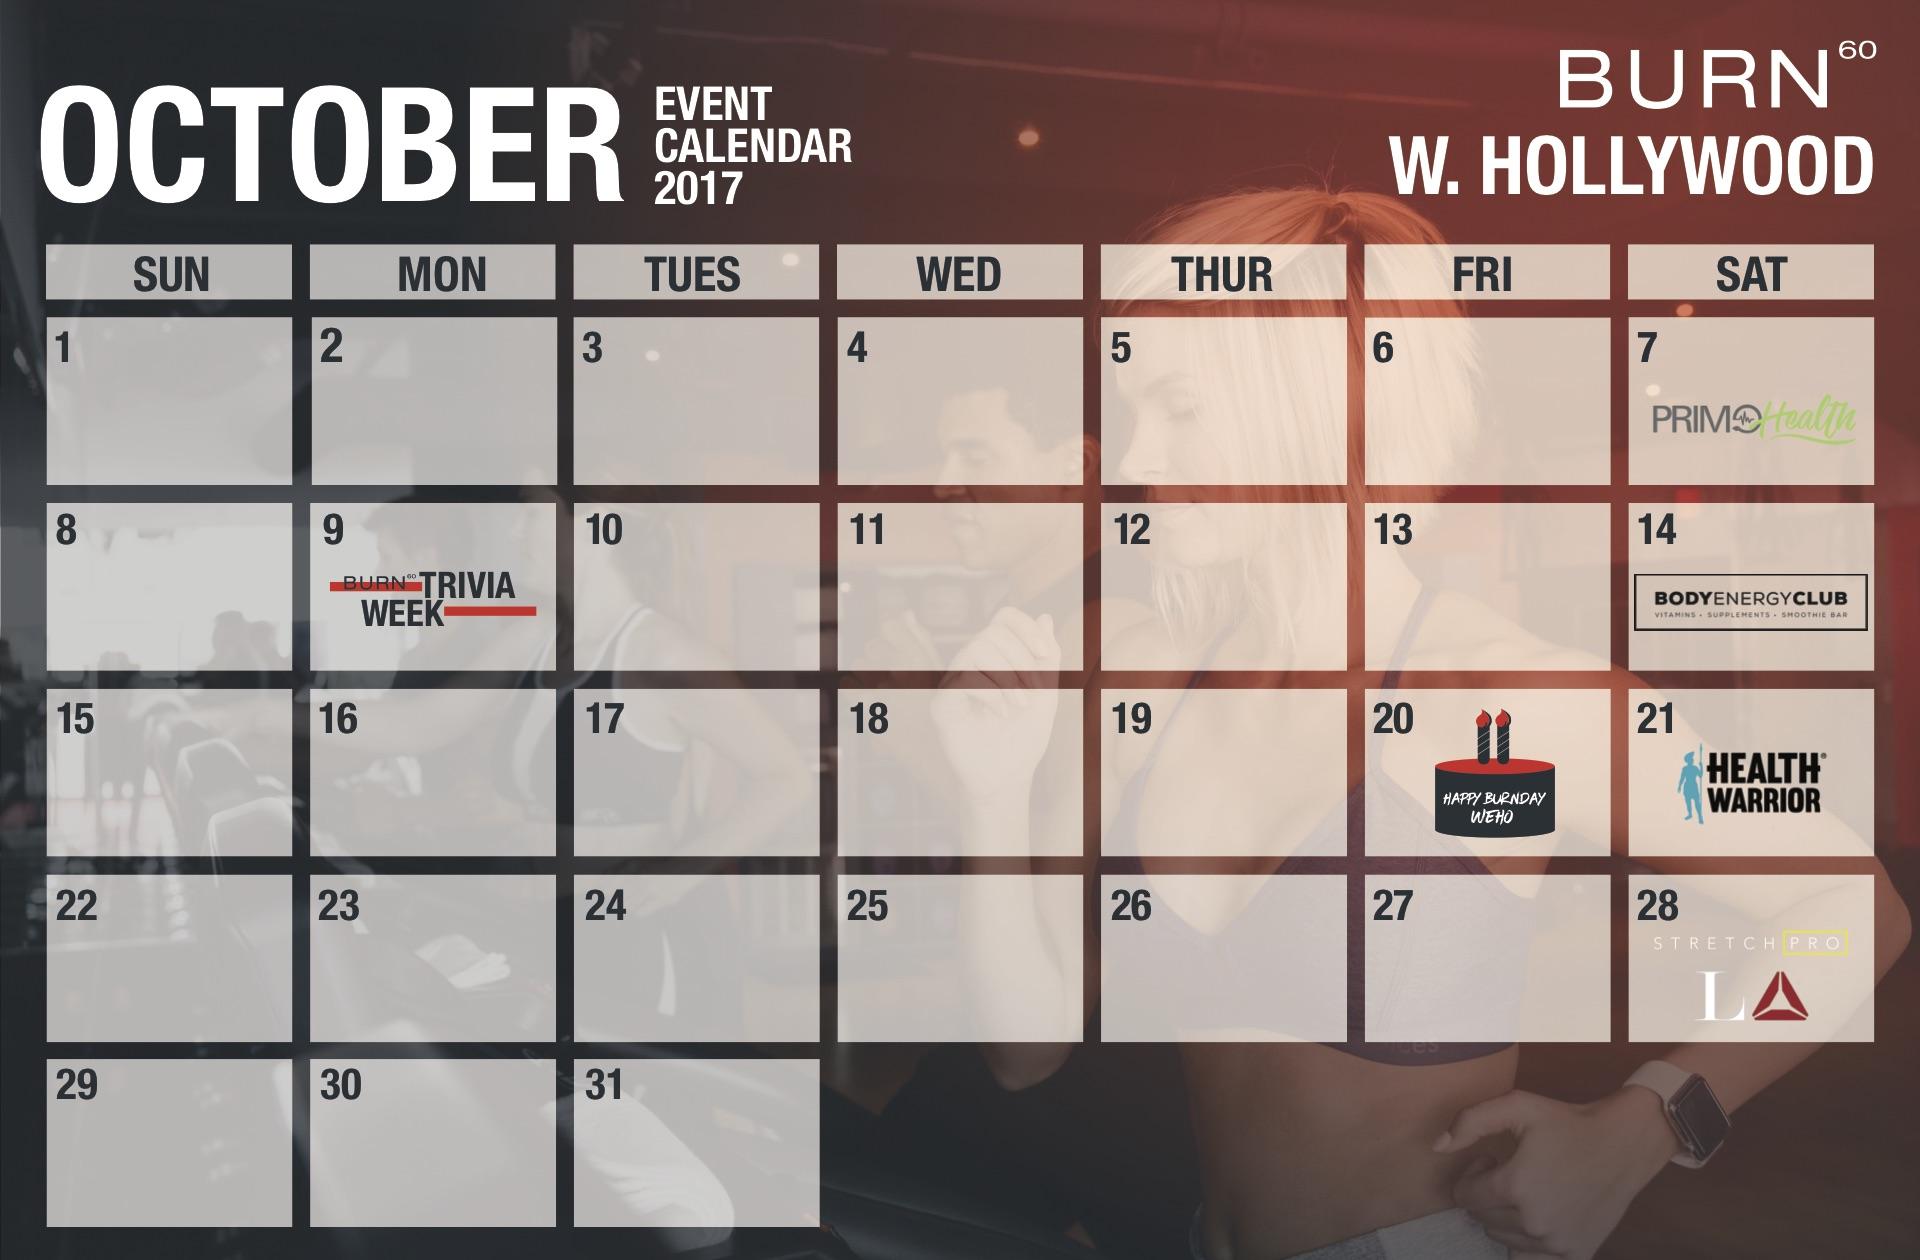 October Calendar Weho.jpg